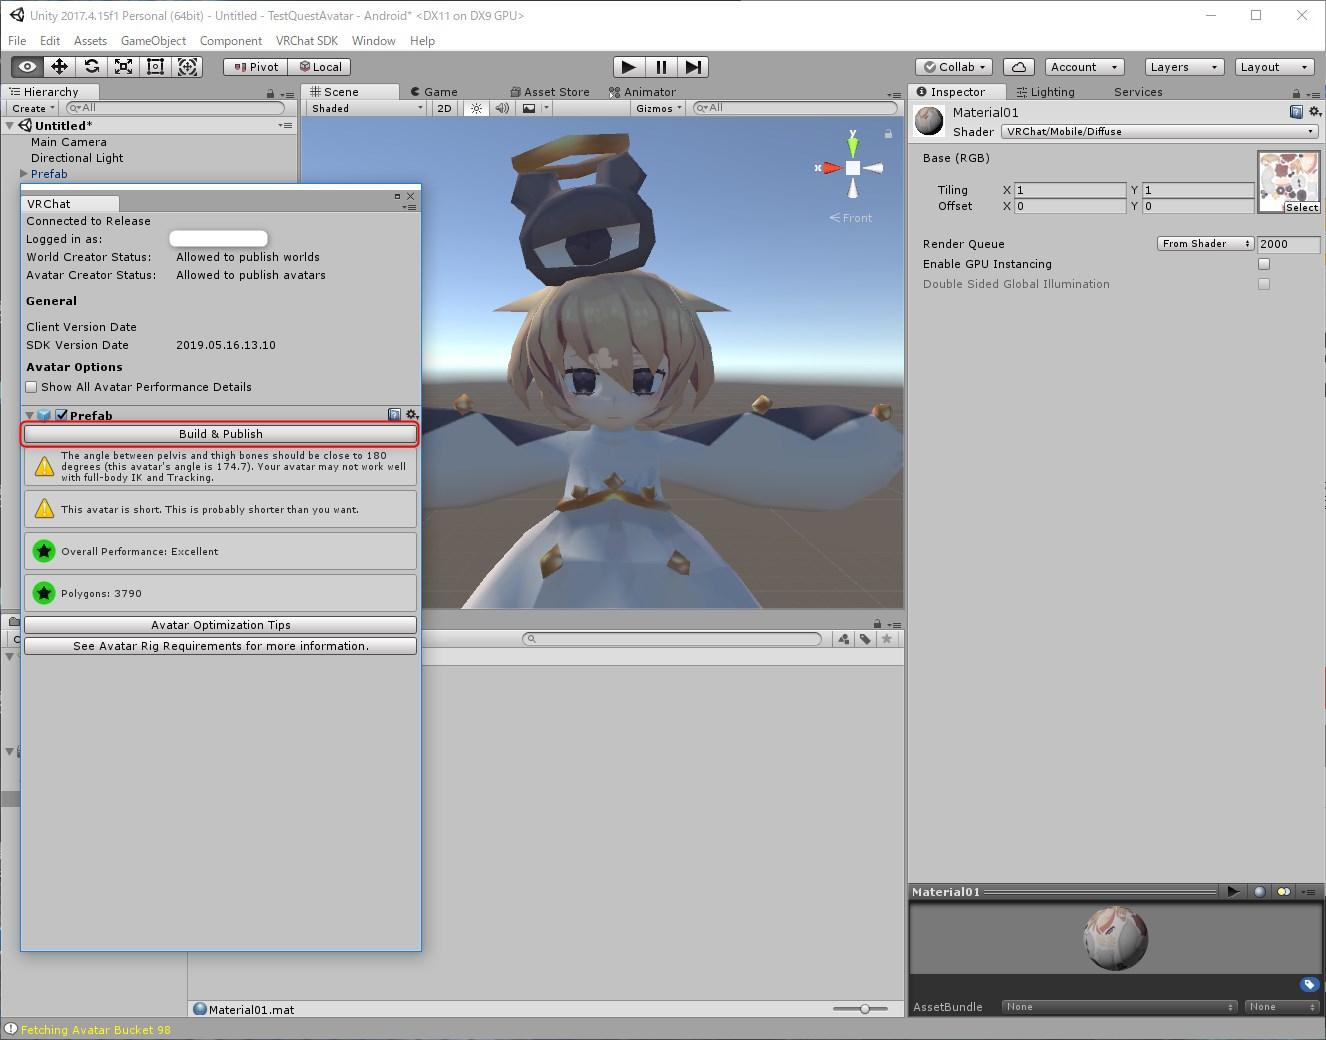 VRChat】OculusQuest用アバターのアップロード方法! | シャオ